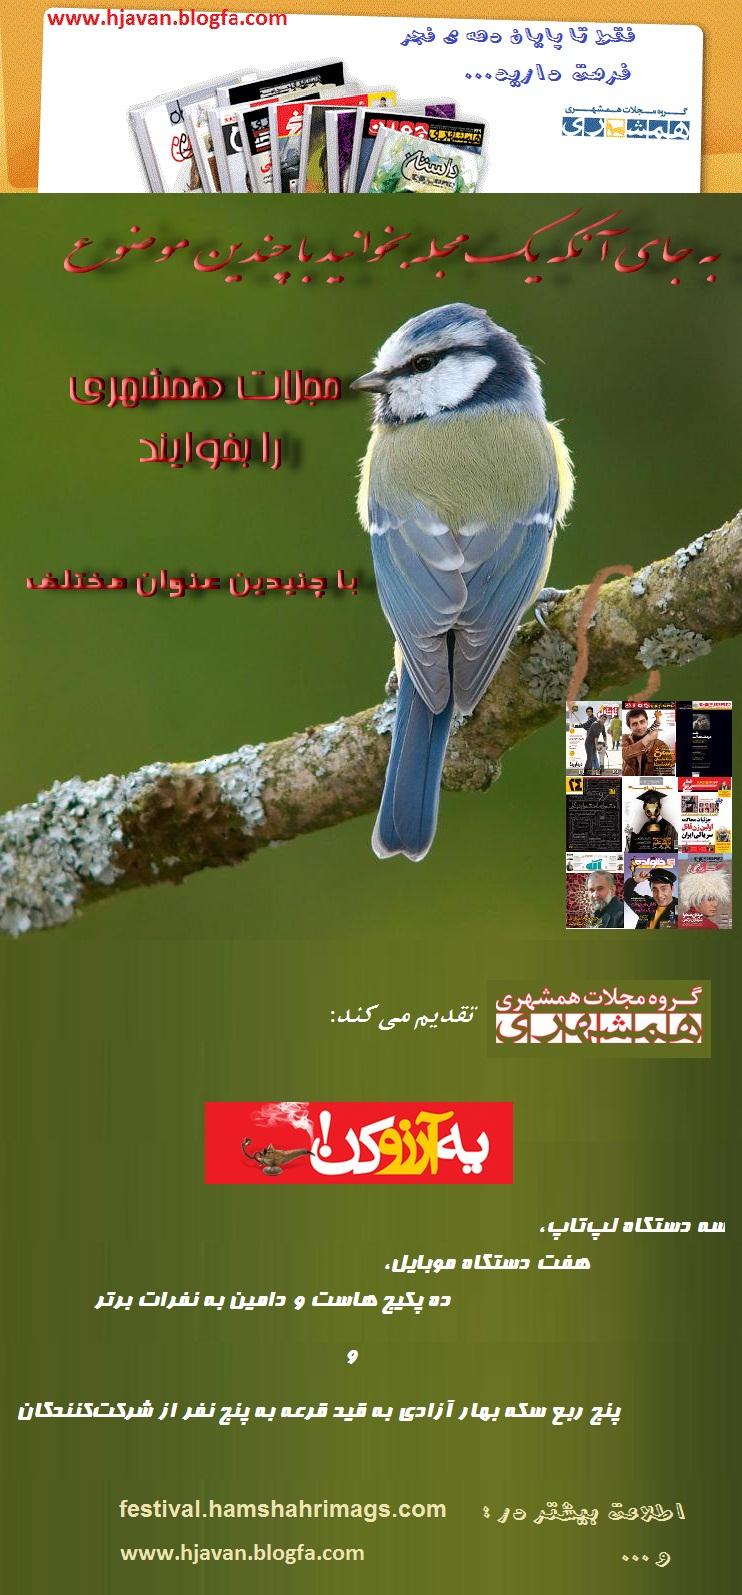 http://hadihossein.persiangig.com/image/012.jpg